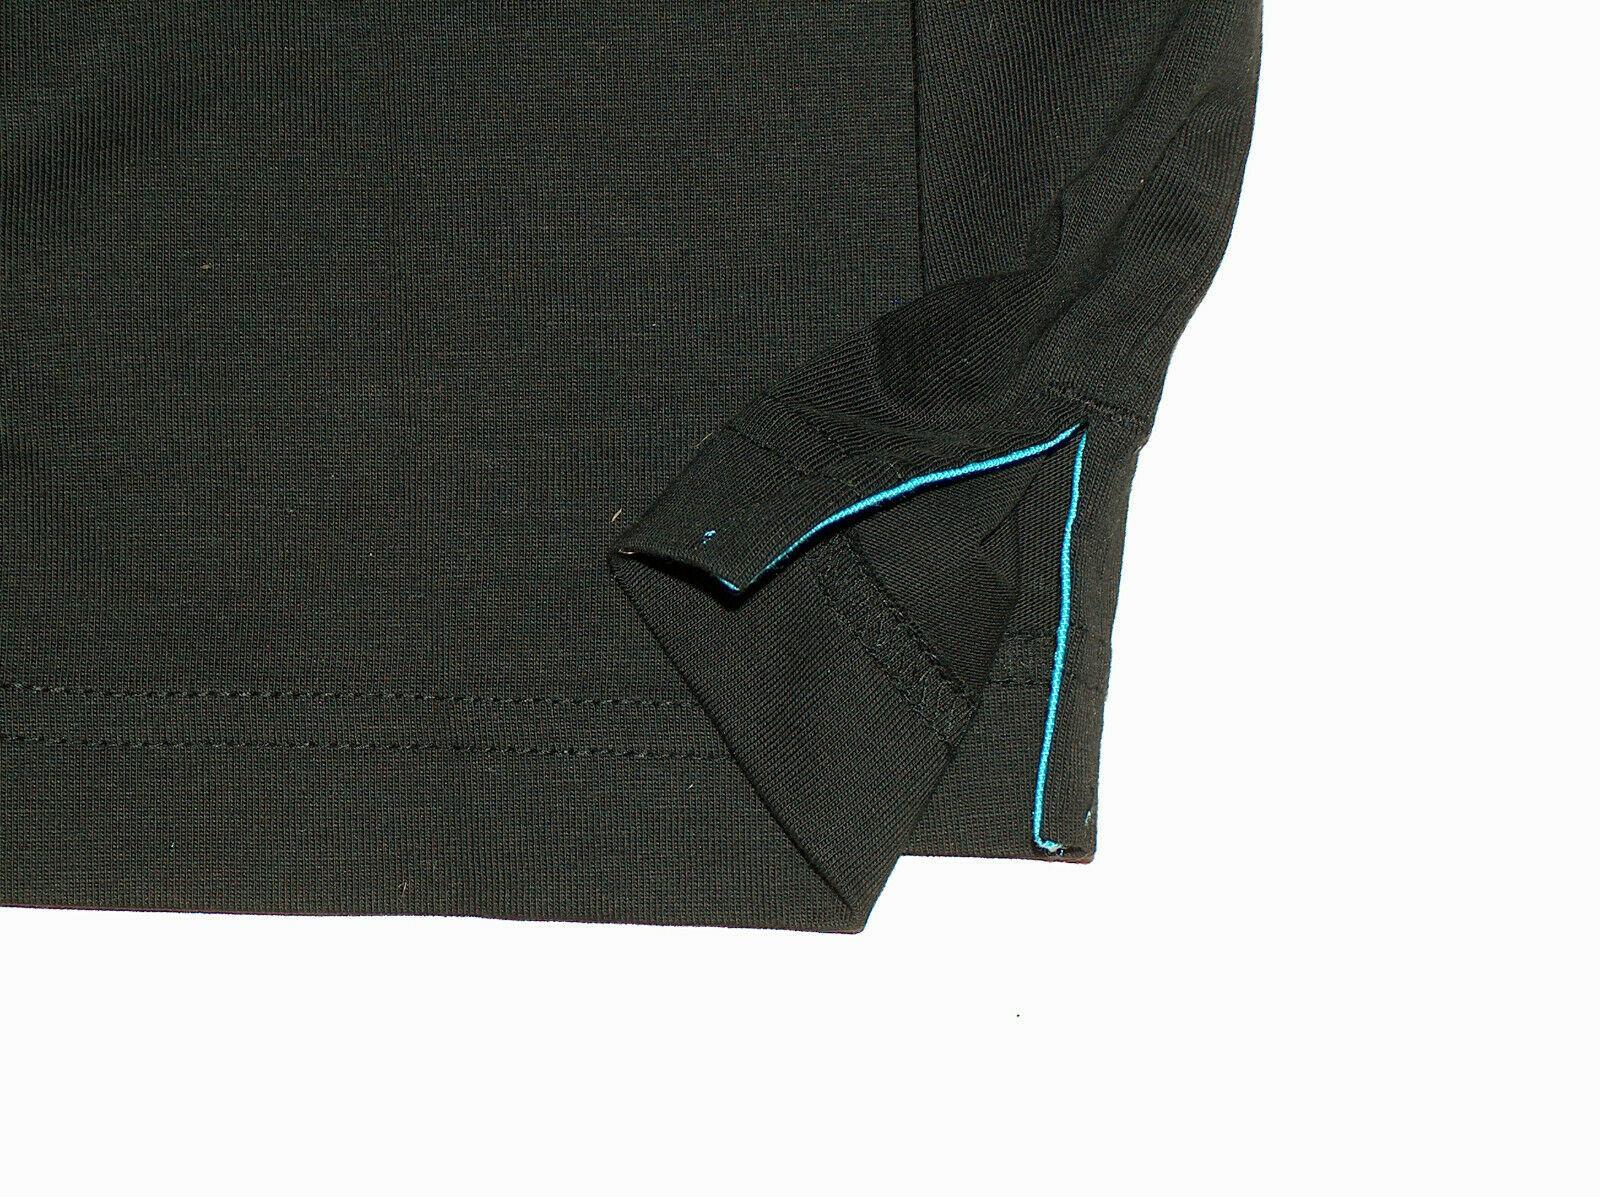 Neuf avec Étiquettes Tommy Bahamas Taille XL Breeze Bleu Marlin